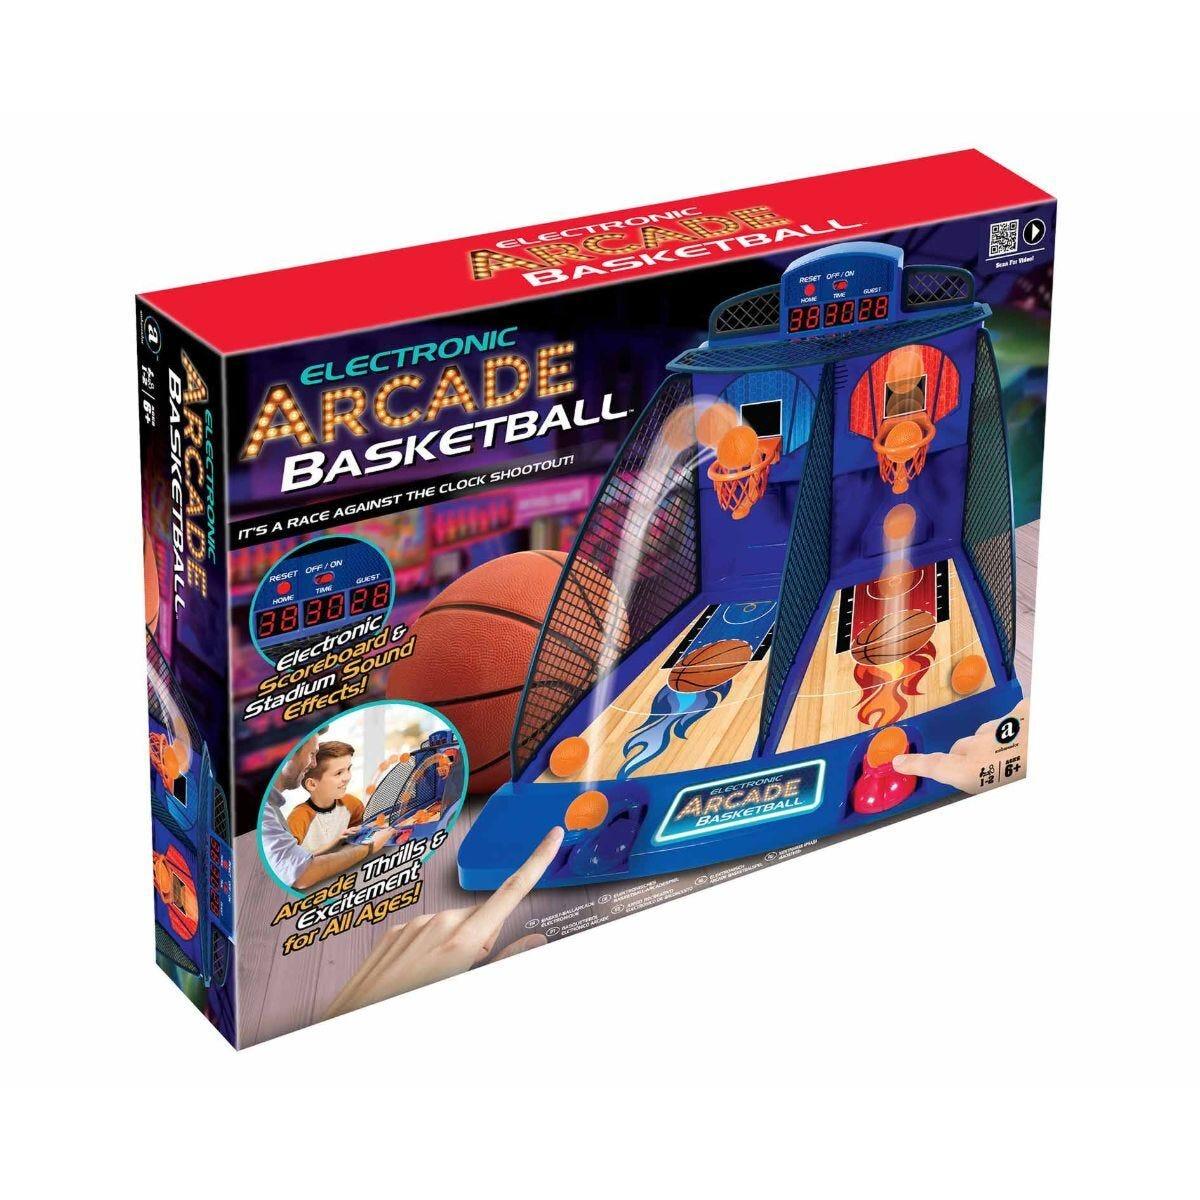 Electronic Arcade Basketball Game